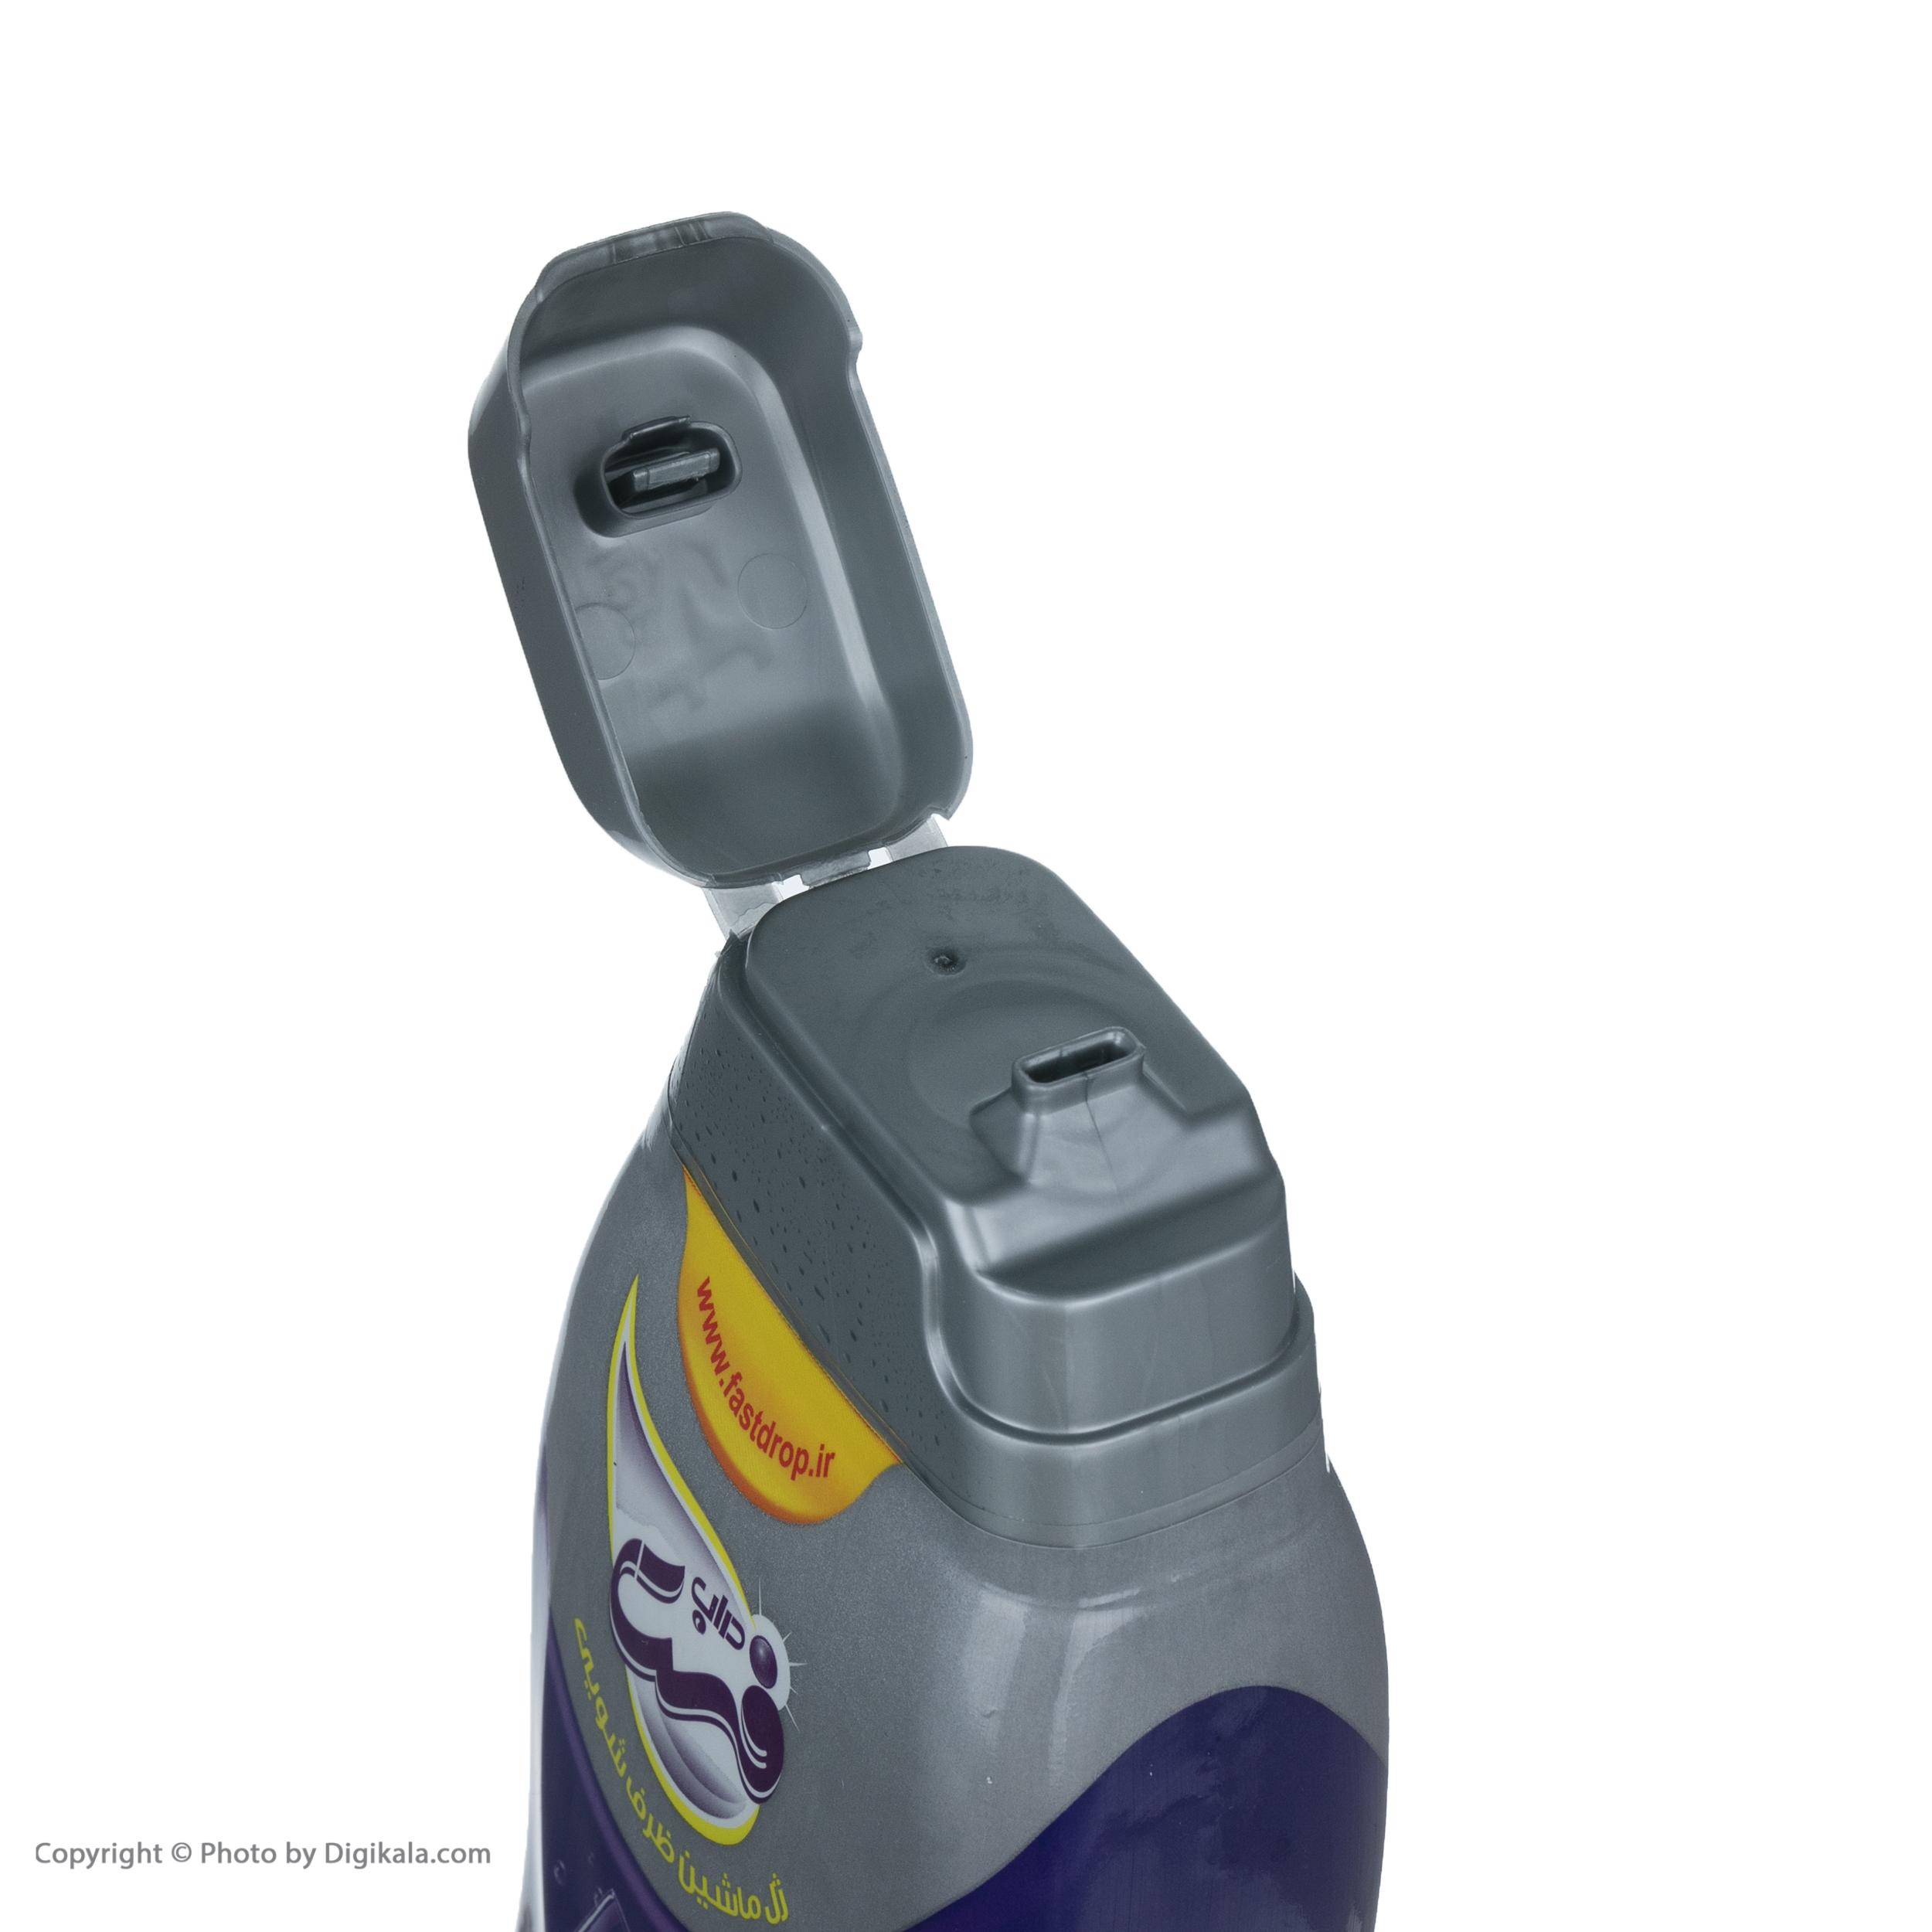 ژل ماشین ظرفشویی فست دراپ مدل All in 1 حجم ا لیتر main 1 3